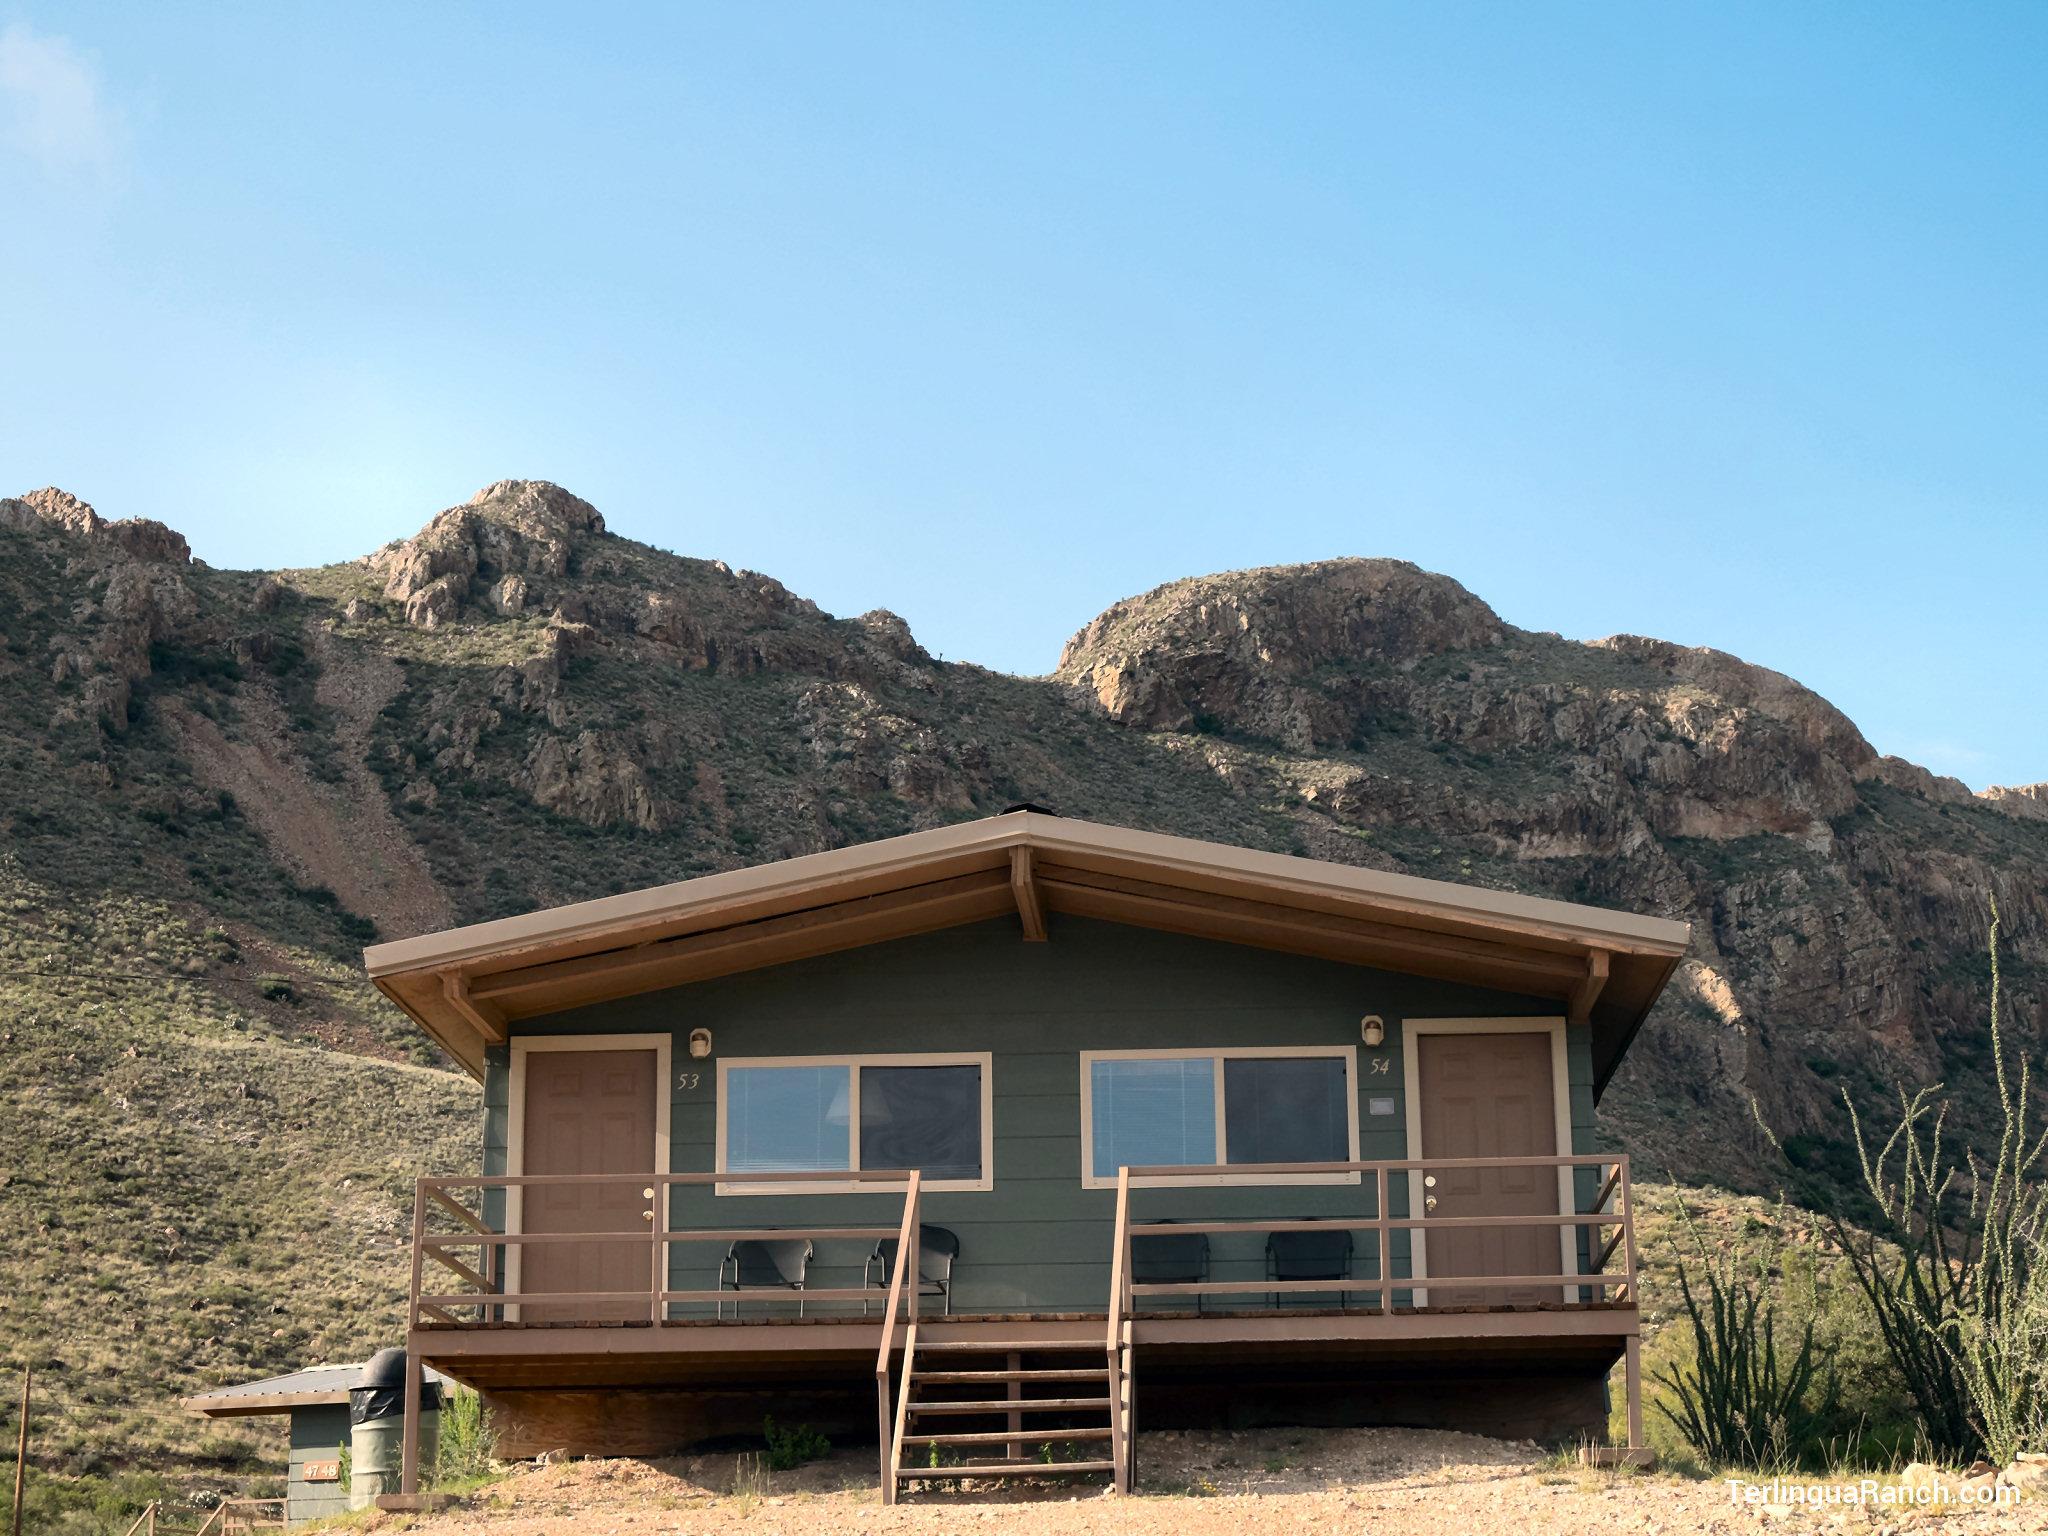 Big bend cabins cozy clean quiet rooms shared decks for Bend cabin rentals